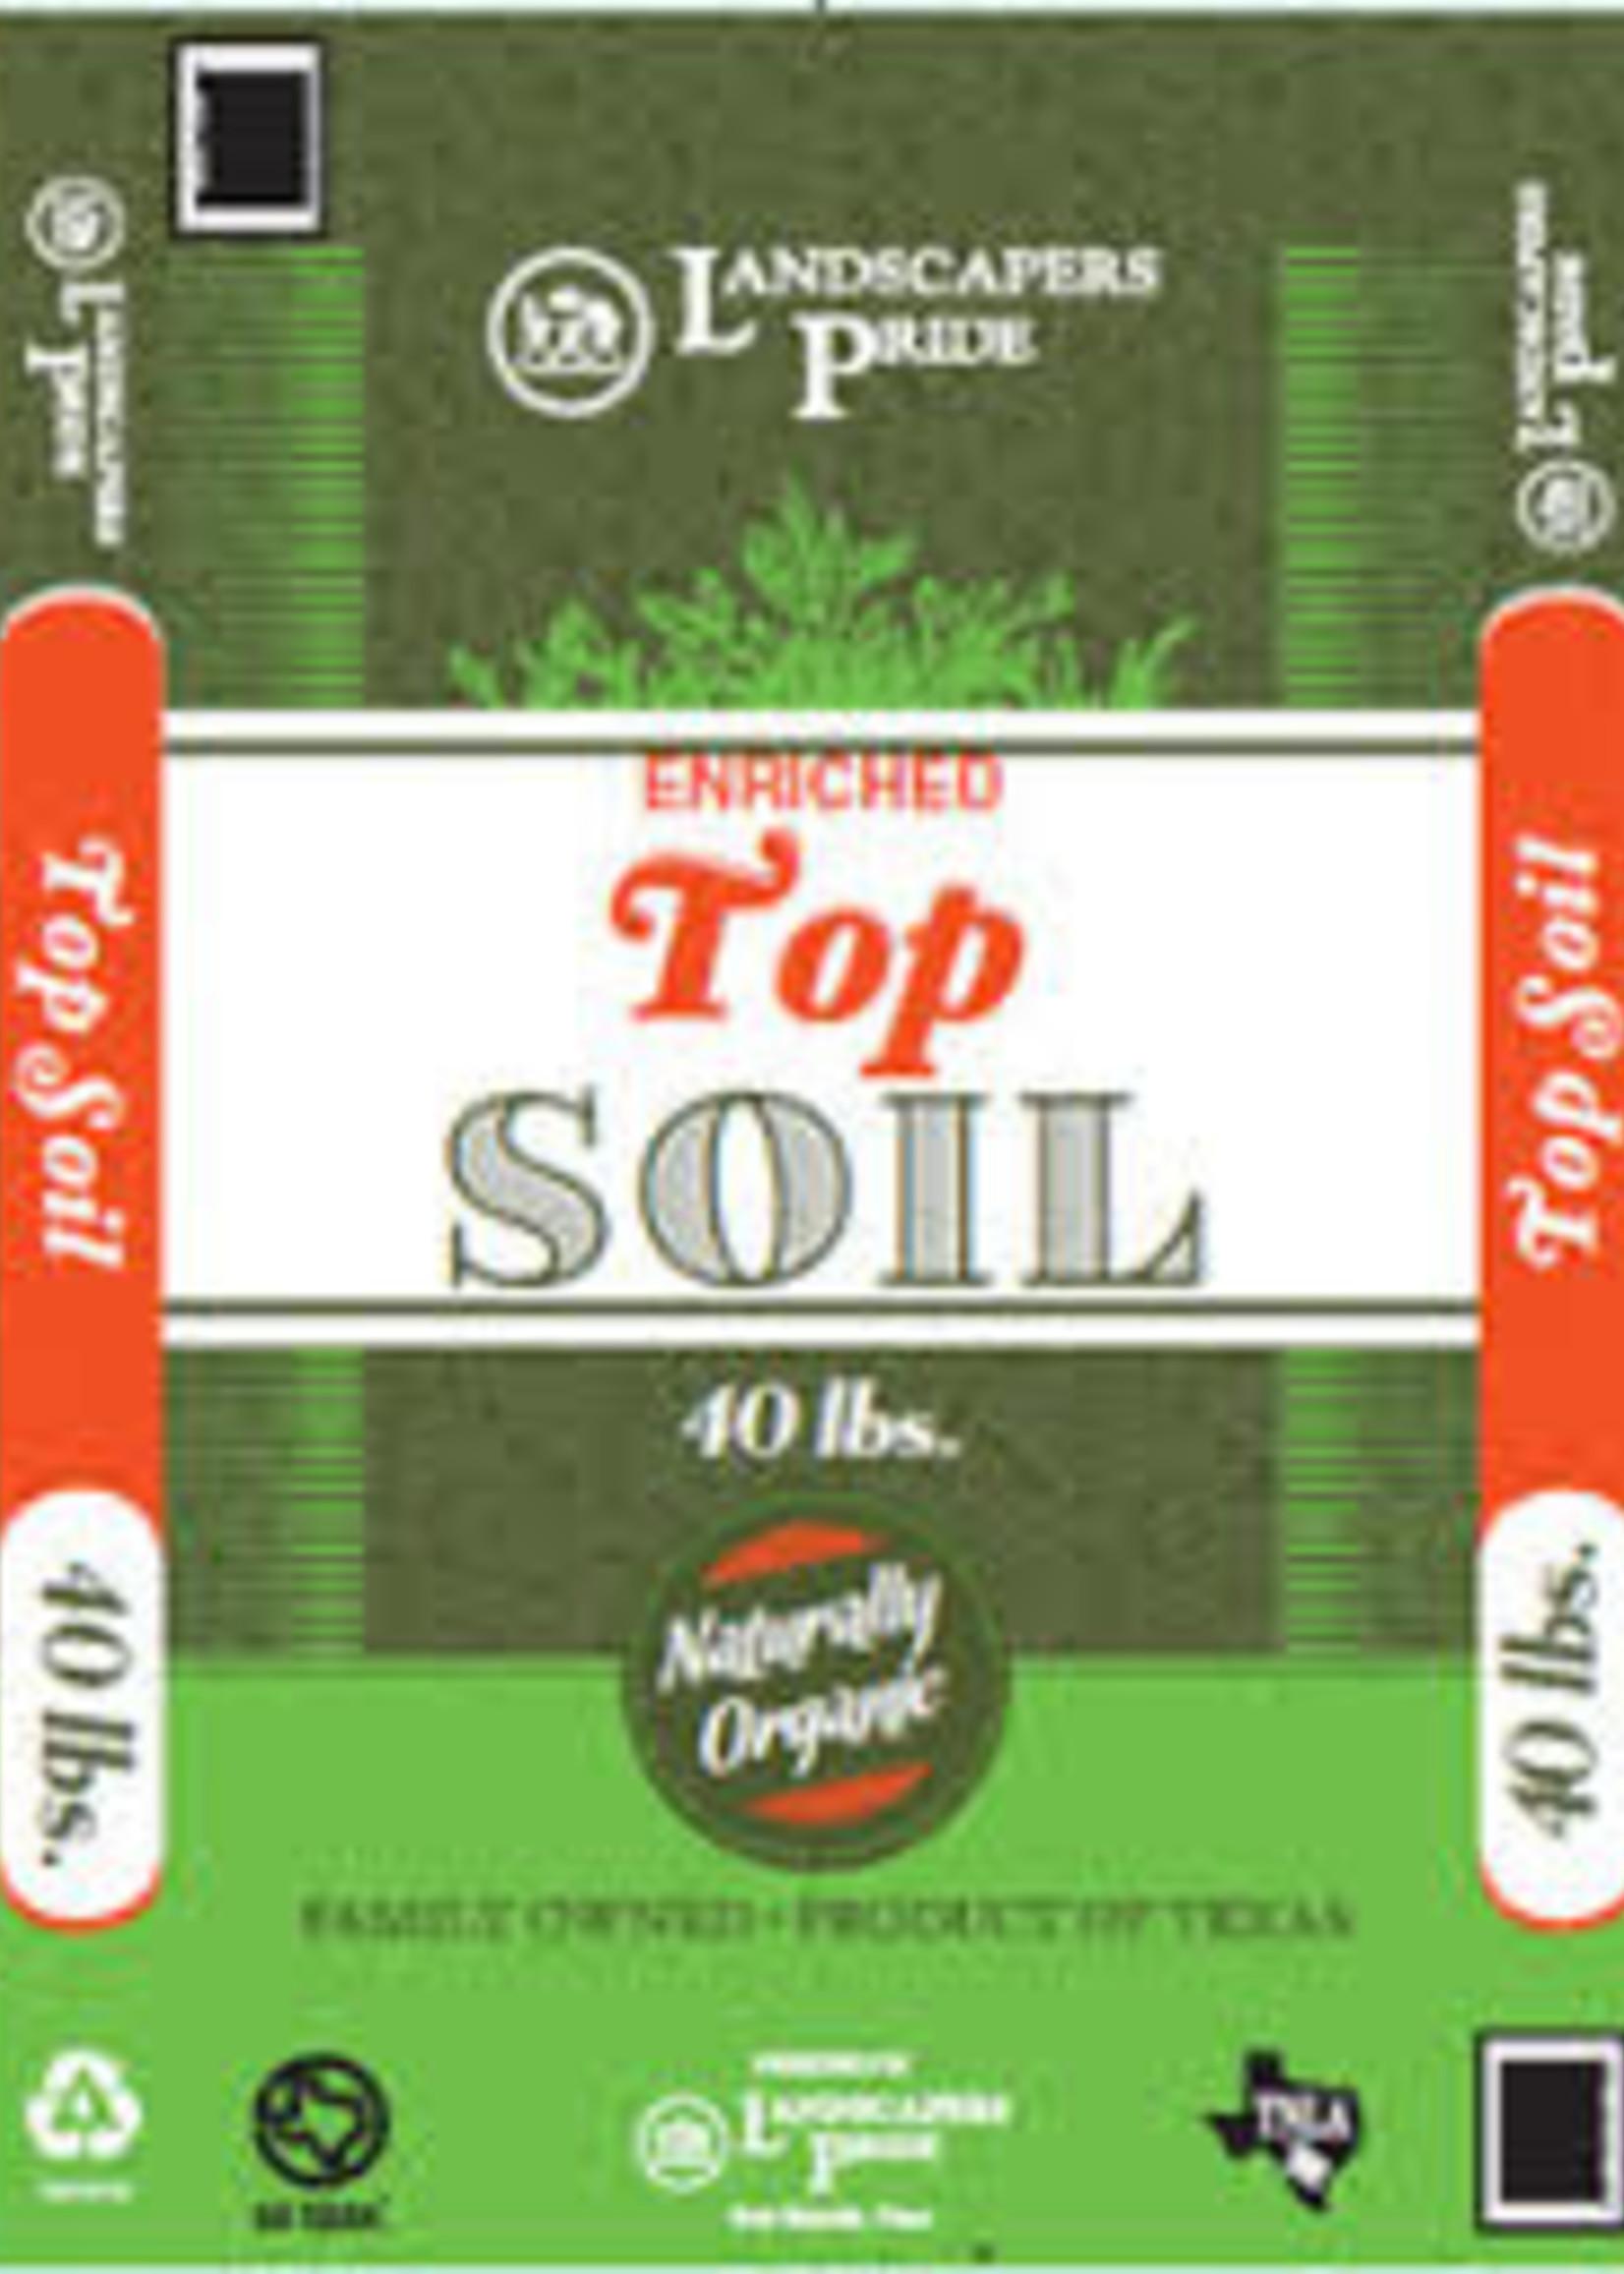 Top Soil 40 lb $3.69 ea.